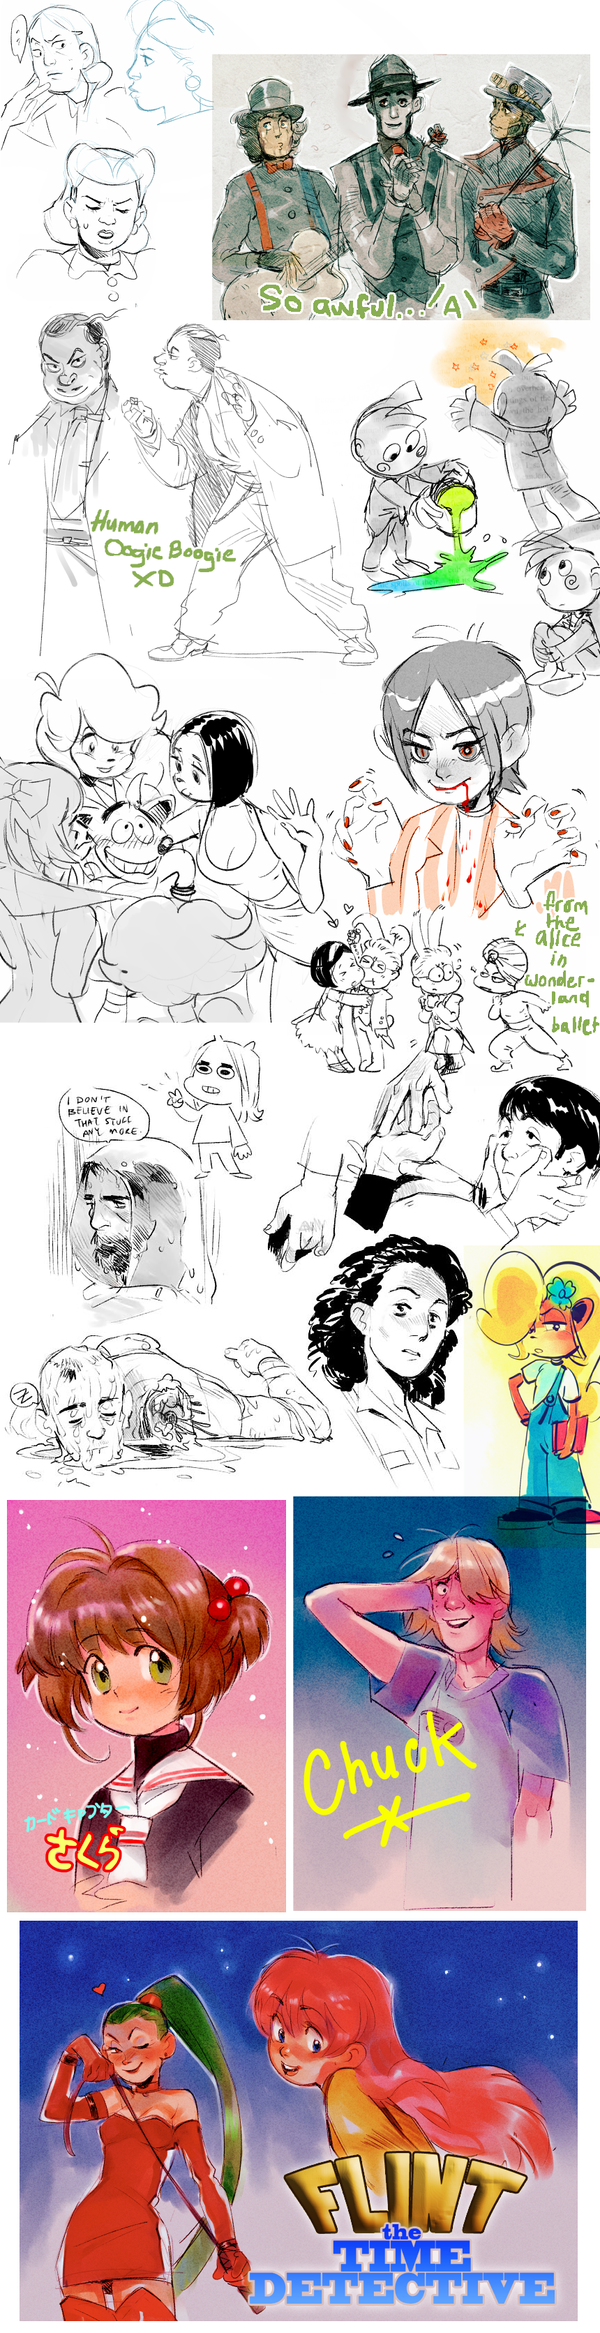 Extremely random sketchdump by Barukurii